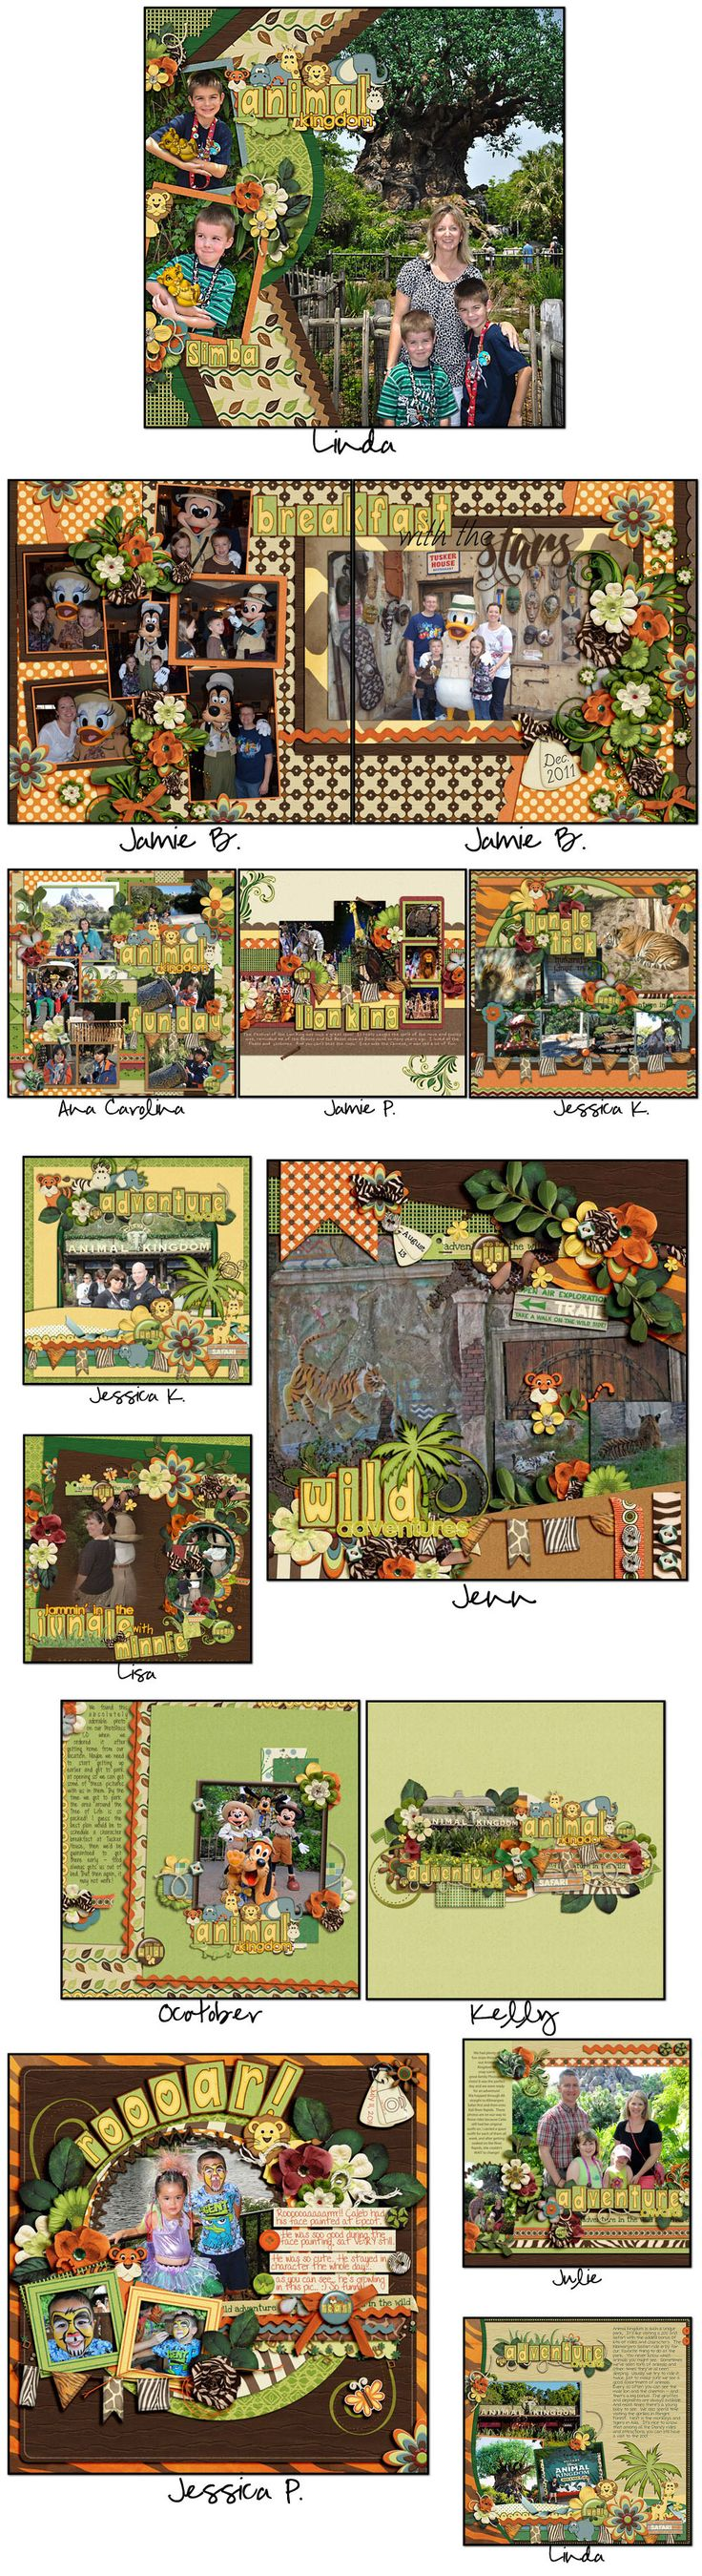 Jungle scrapbook ideas - Ctlosjunglejam Jungle Jamdisney Scrapbookdigital Scrapbookscrapbooking Ideasscrapbook